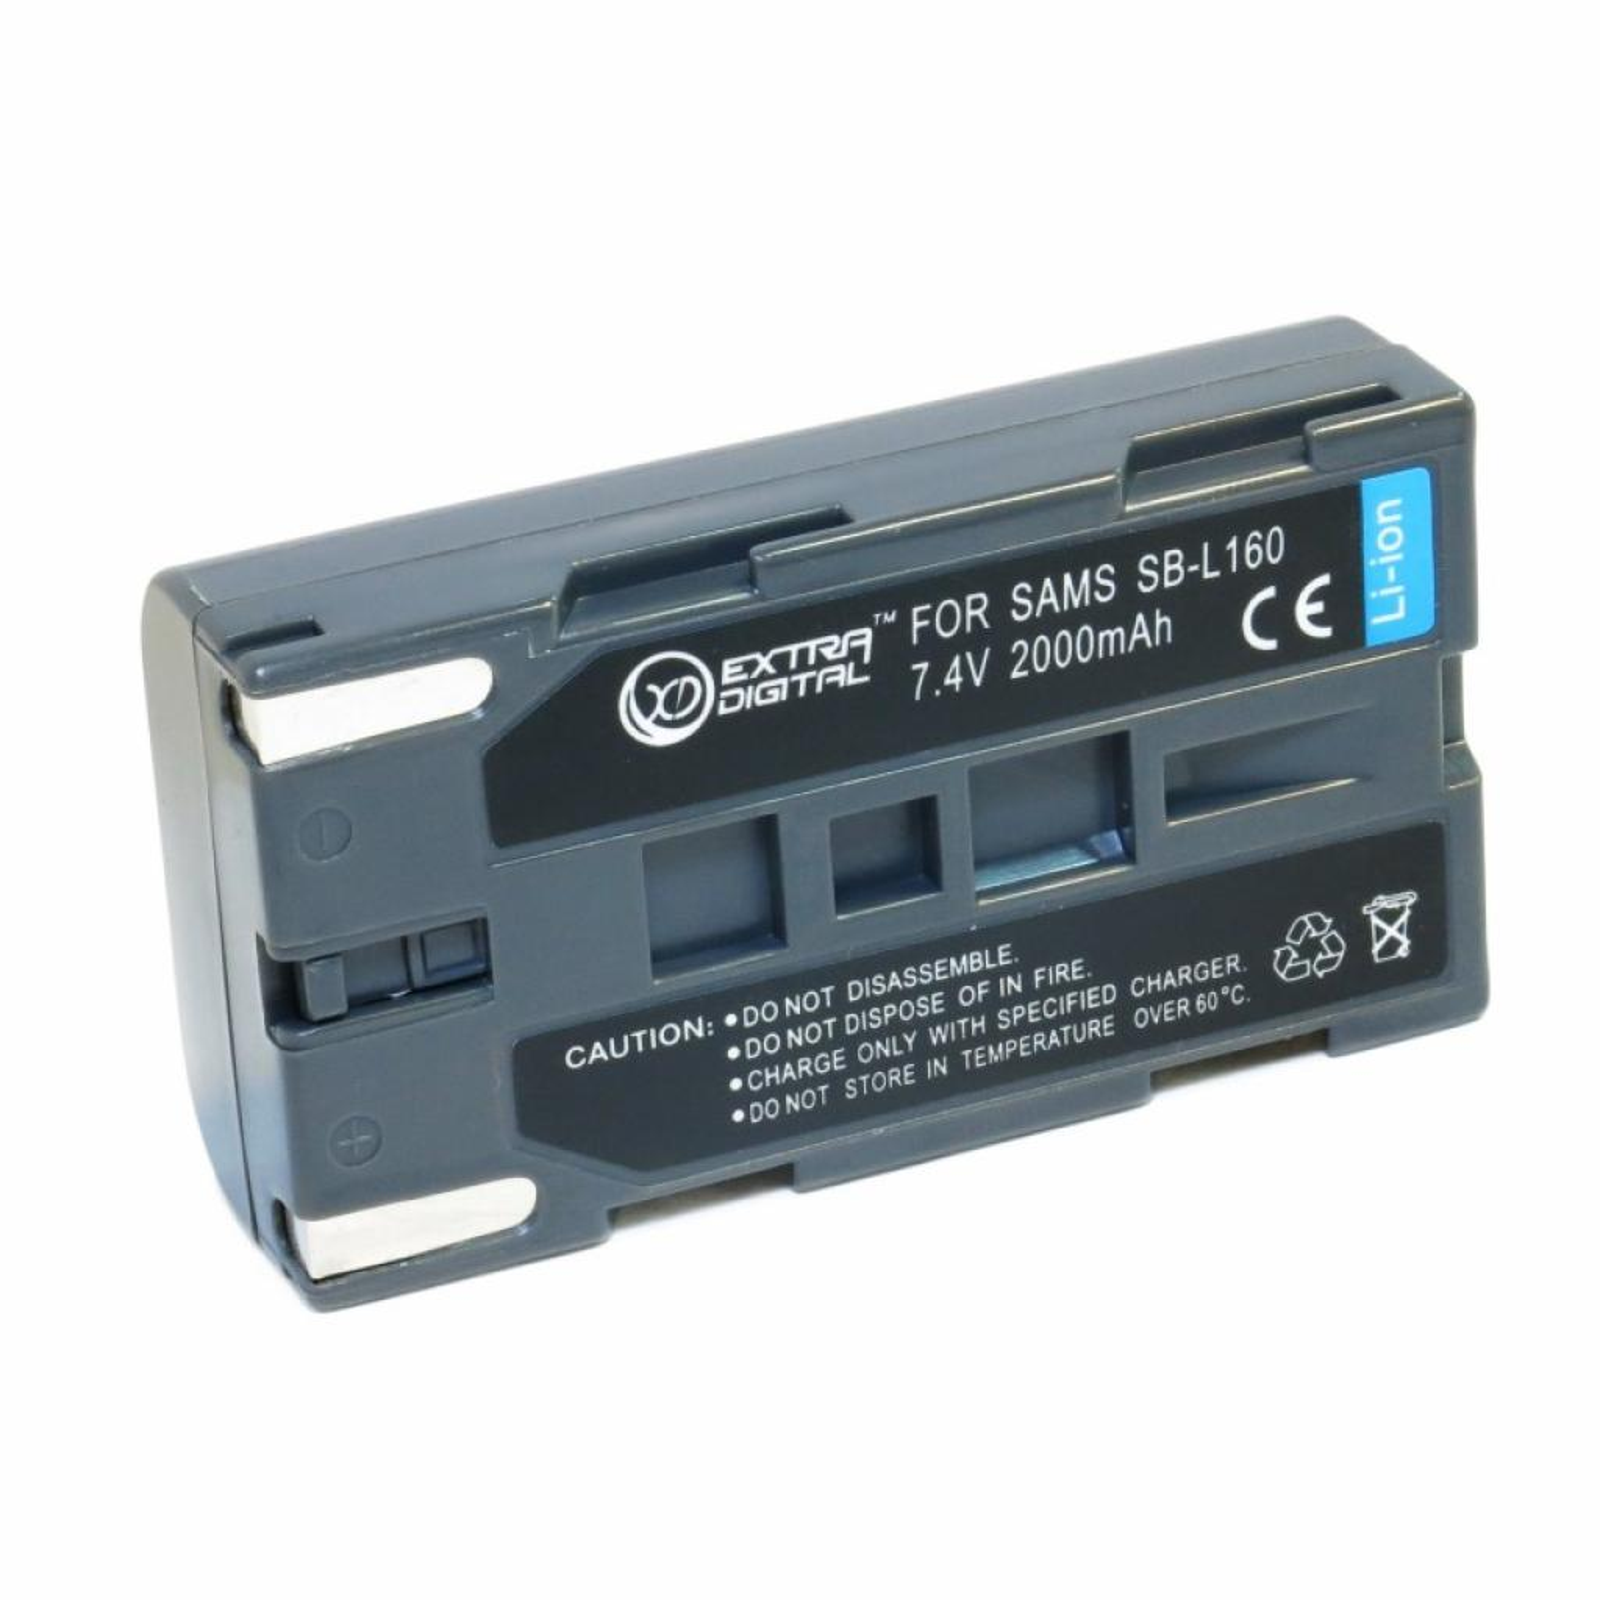 Аккумулятор к фото/видео EXTRADIGITAL Samsung SB-L160 (DV00DV1277)